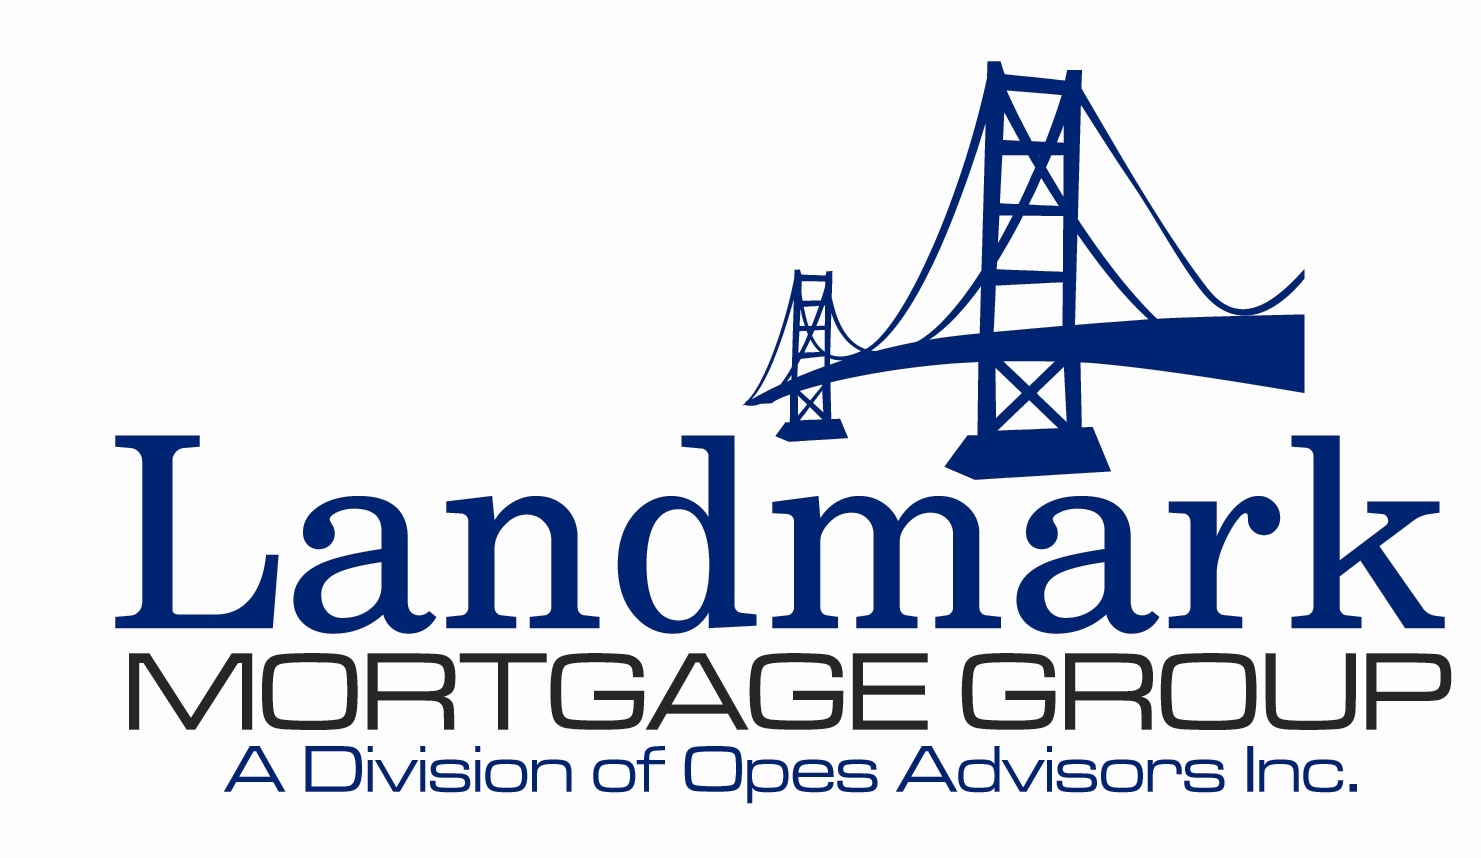 Landmark Mortgage Group